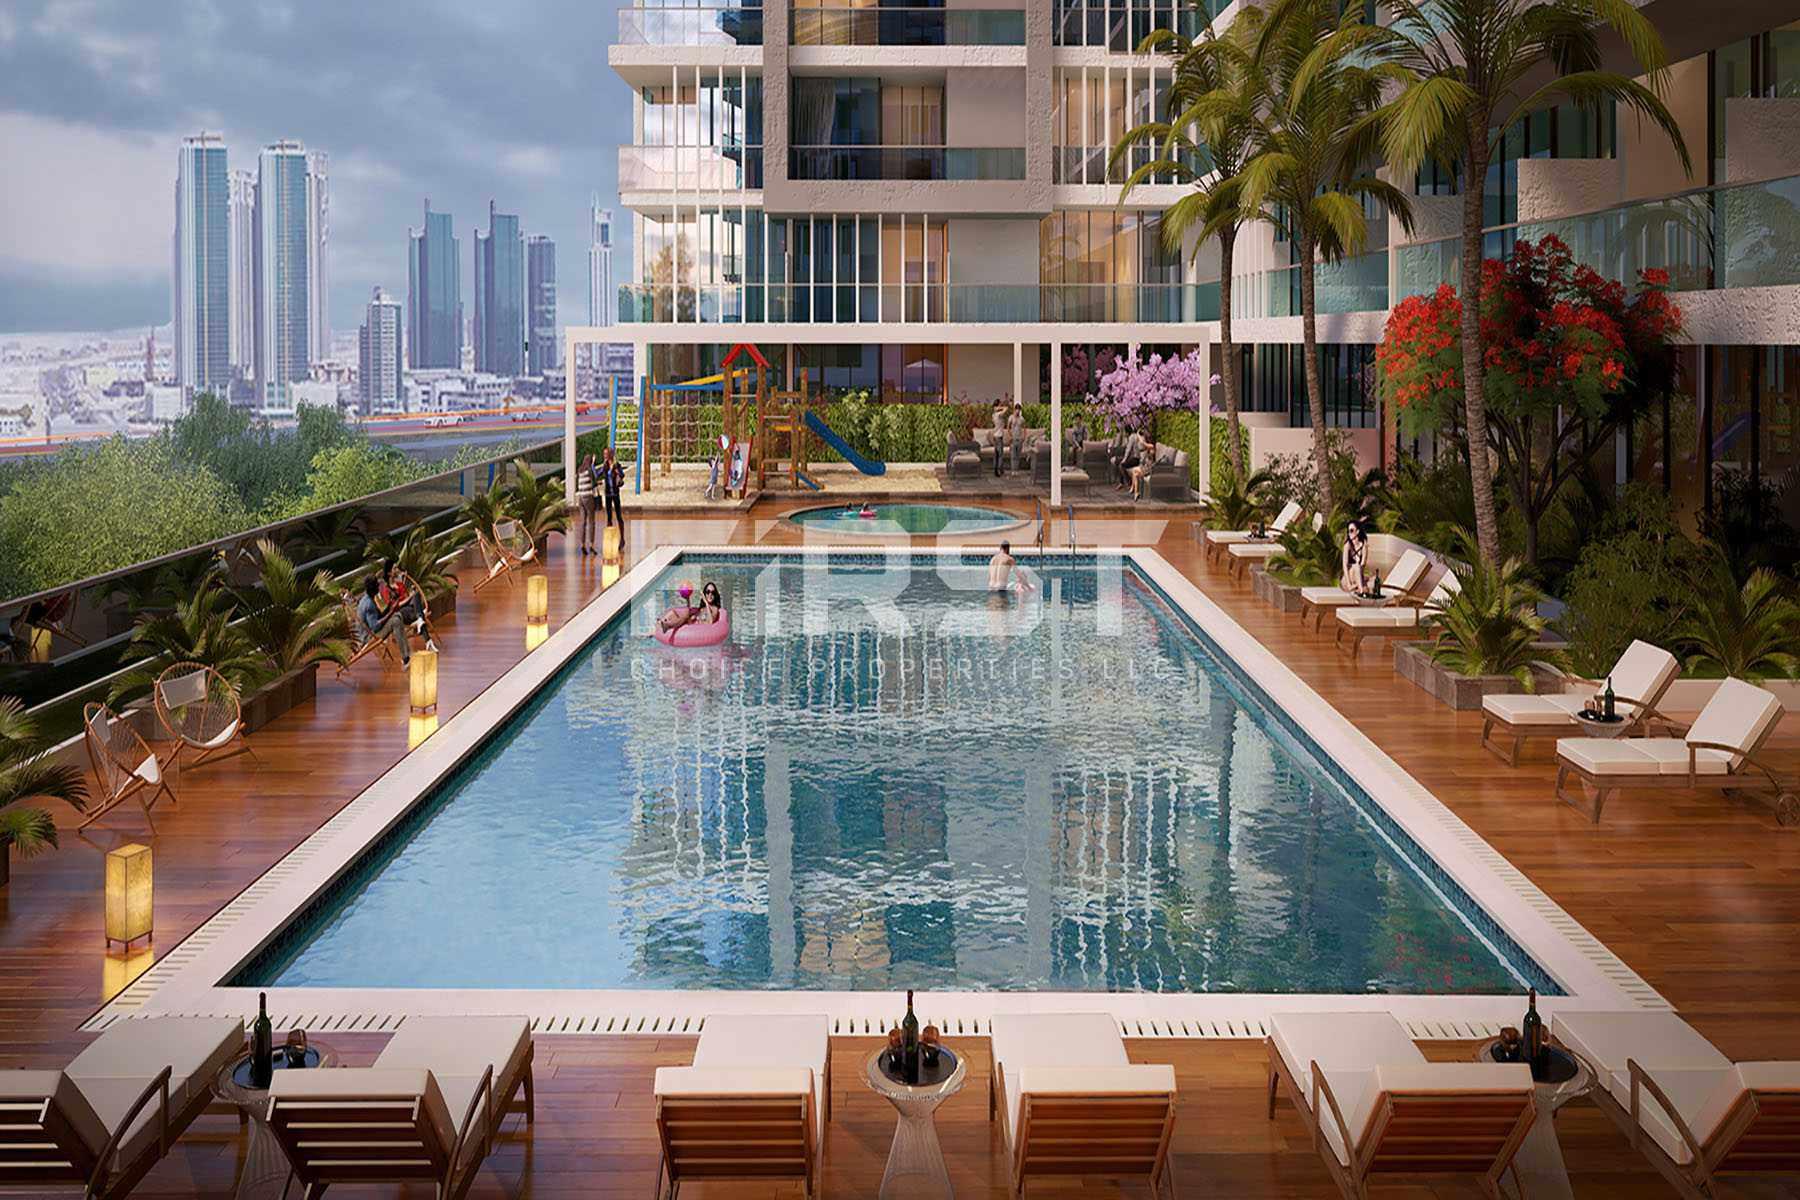 Al Maryah Vista Residence,Al Maryah Island, Abu Dhabi-UAE (9).jpg